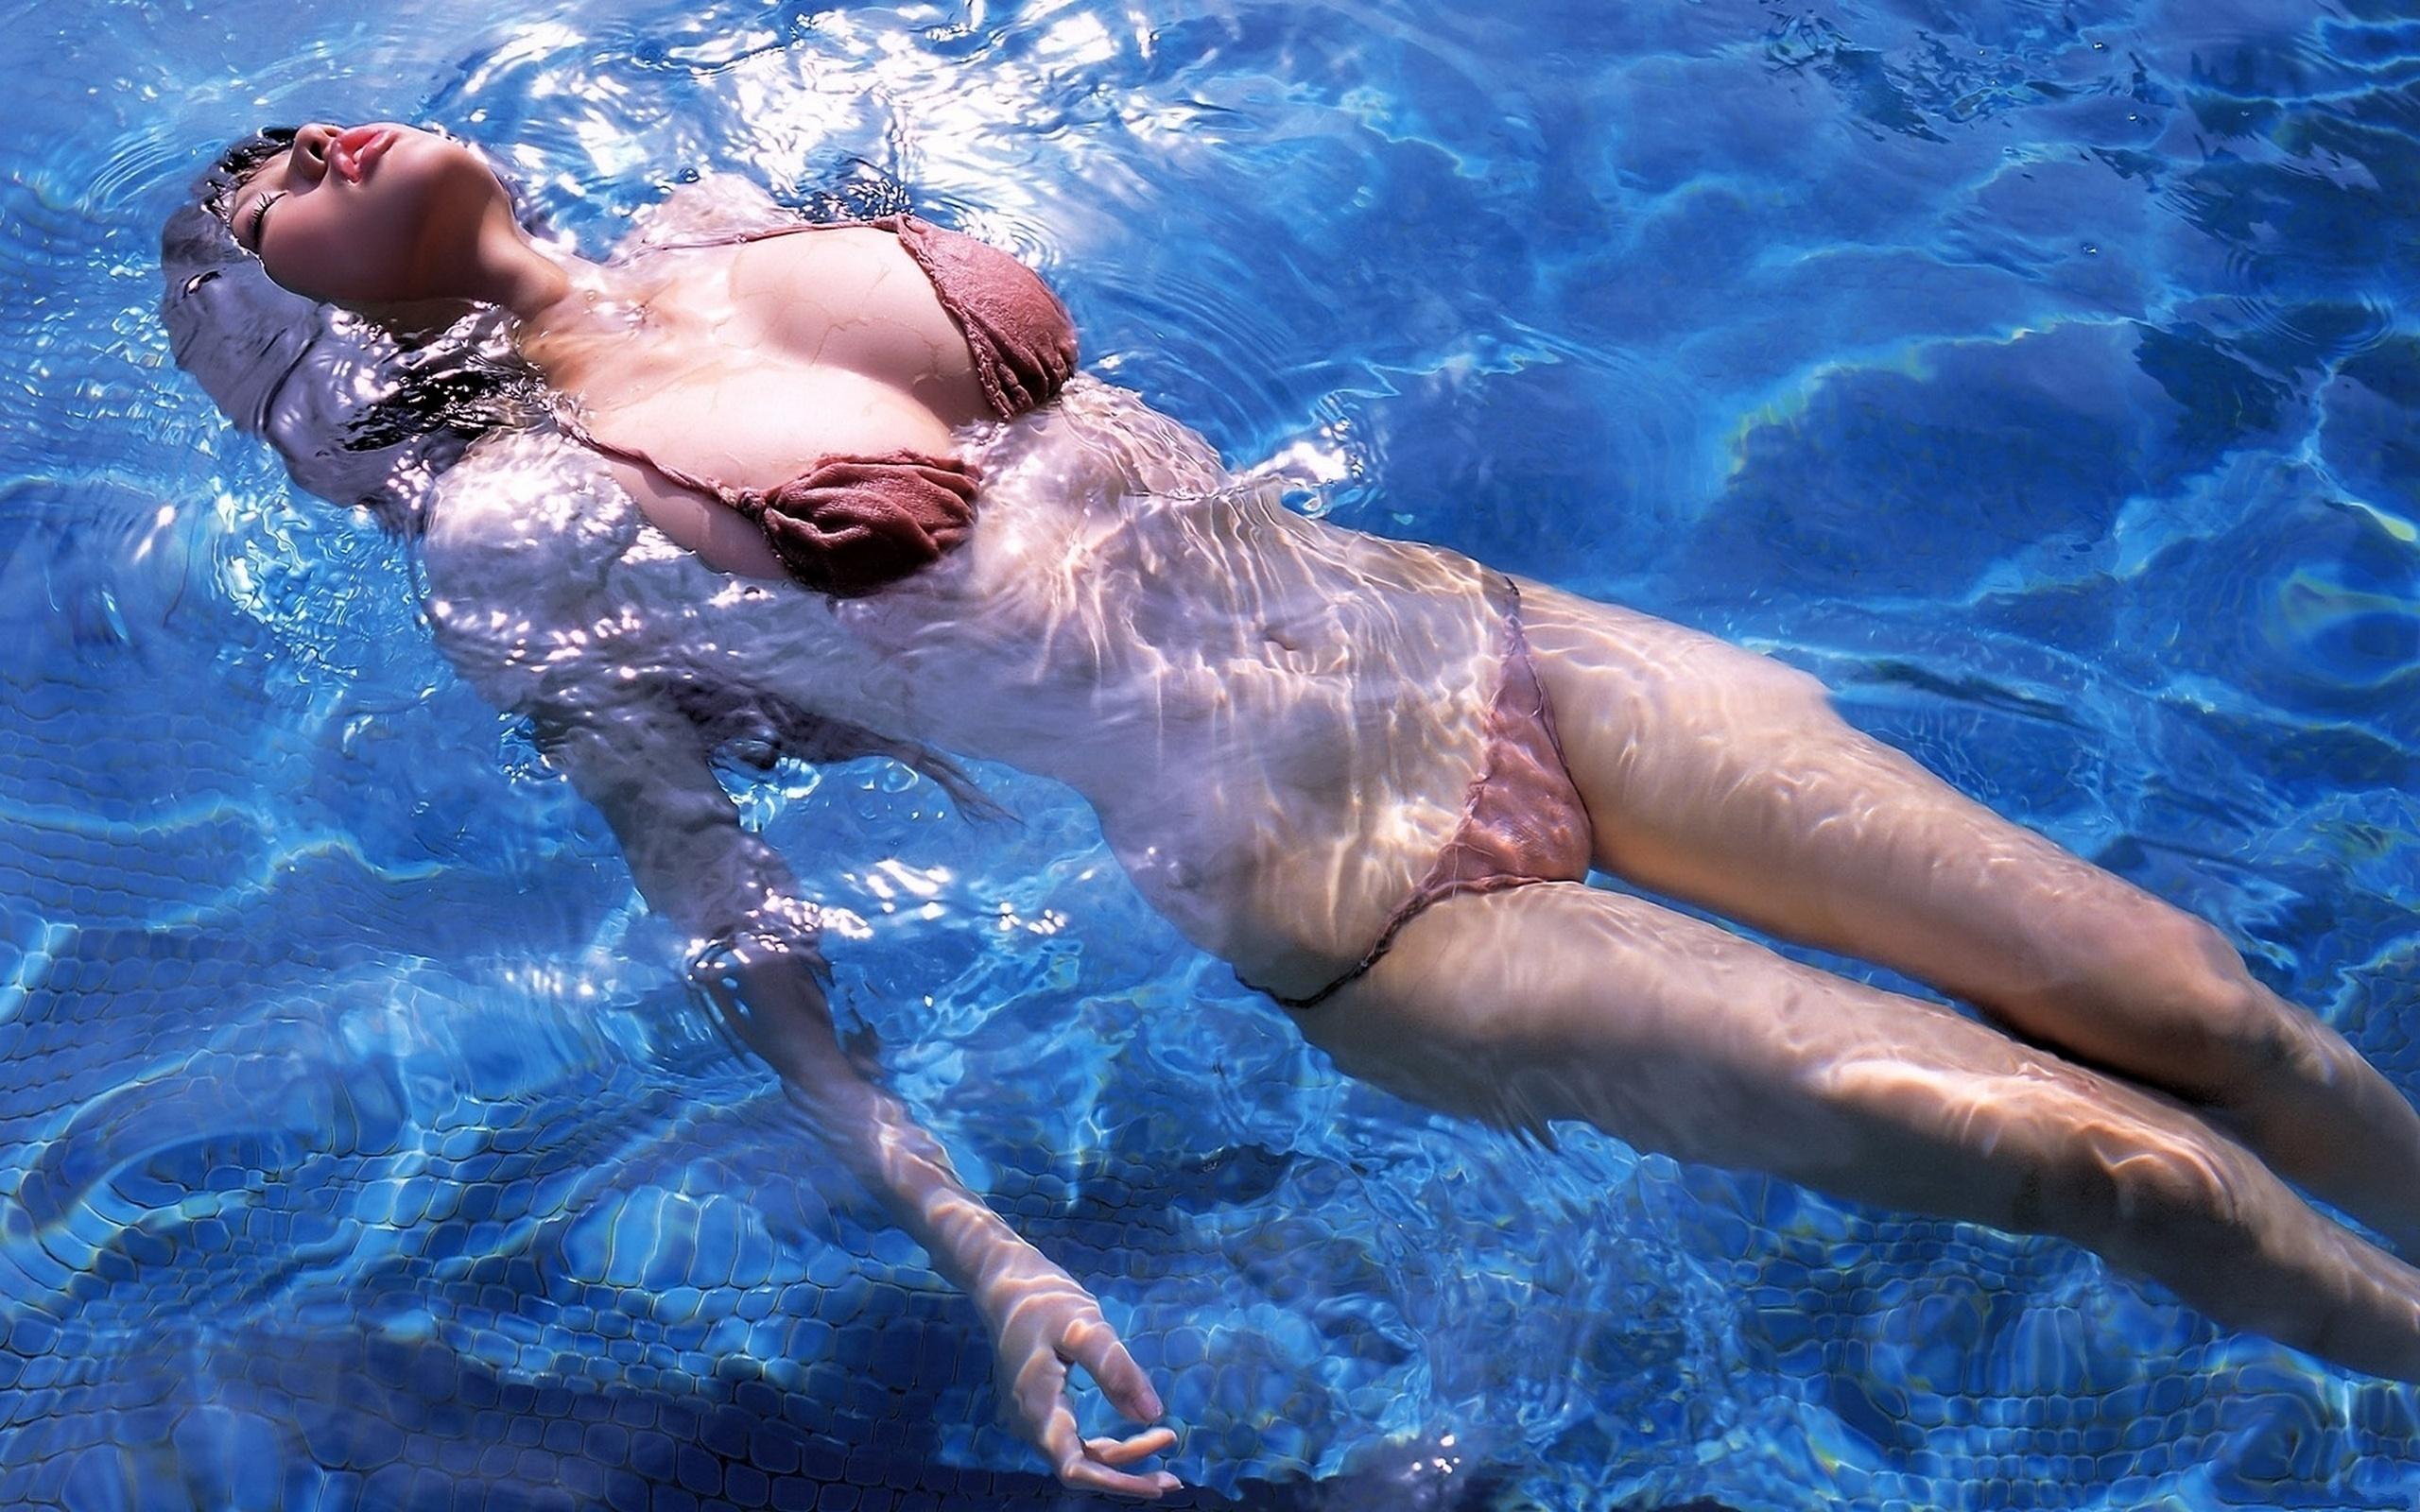 Залили водой жопу девушки видео